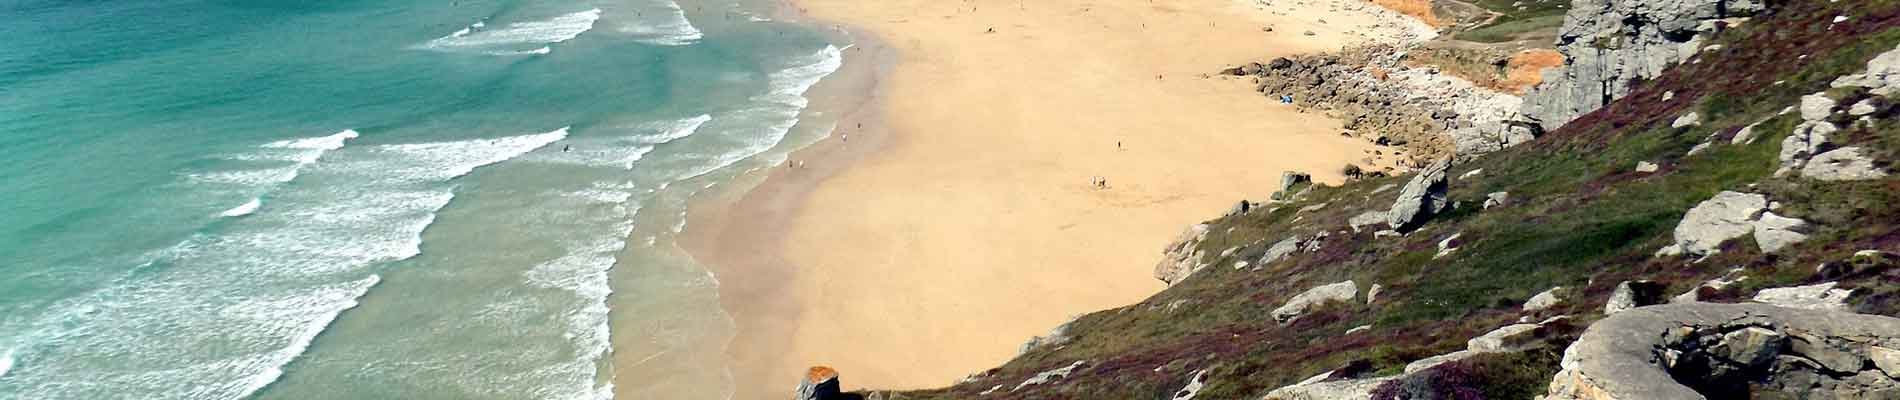 plage Morbihan